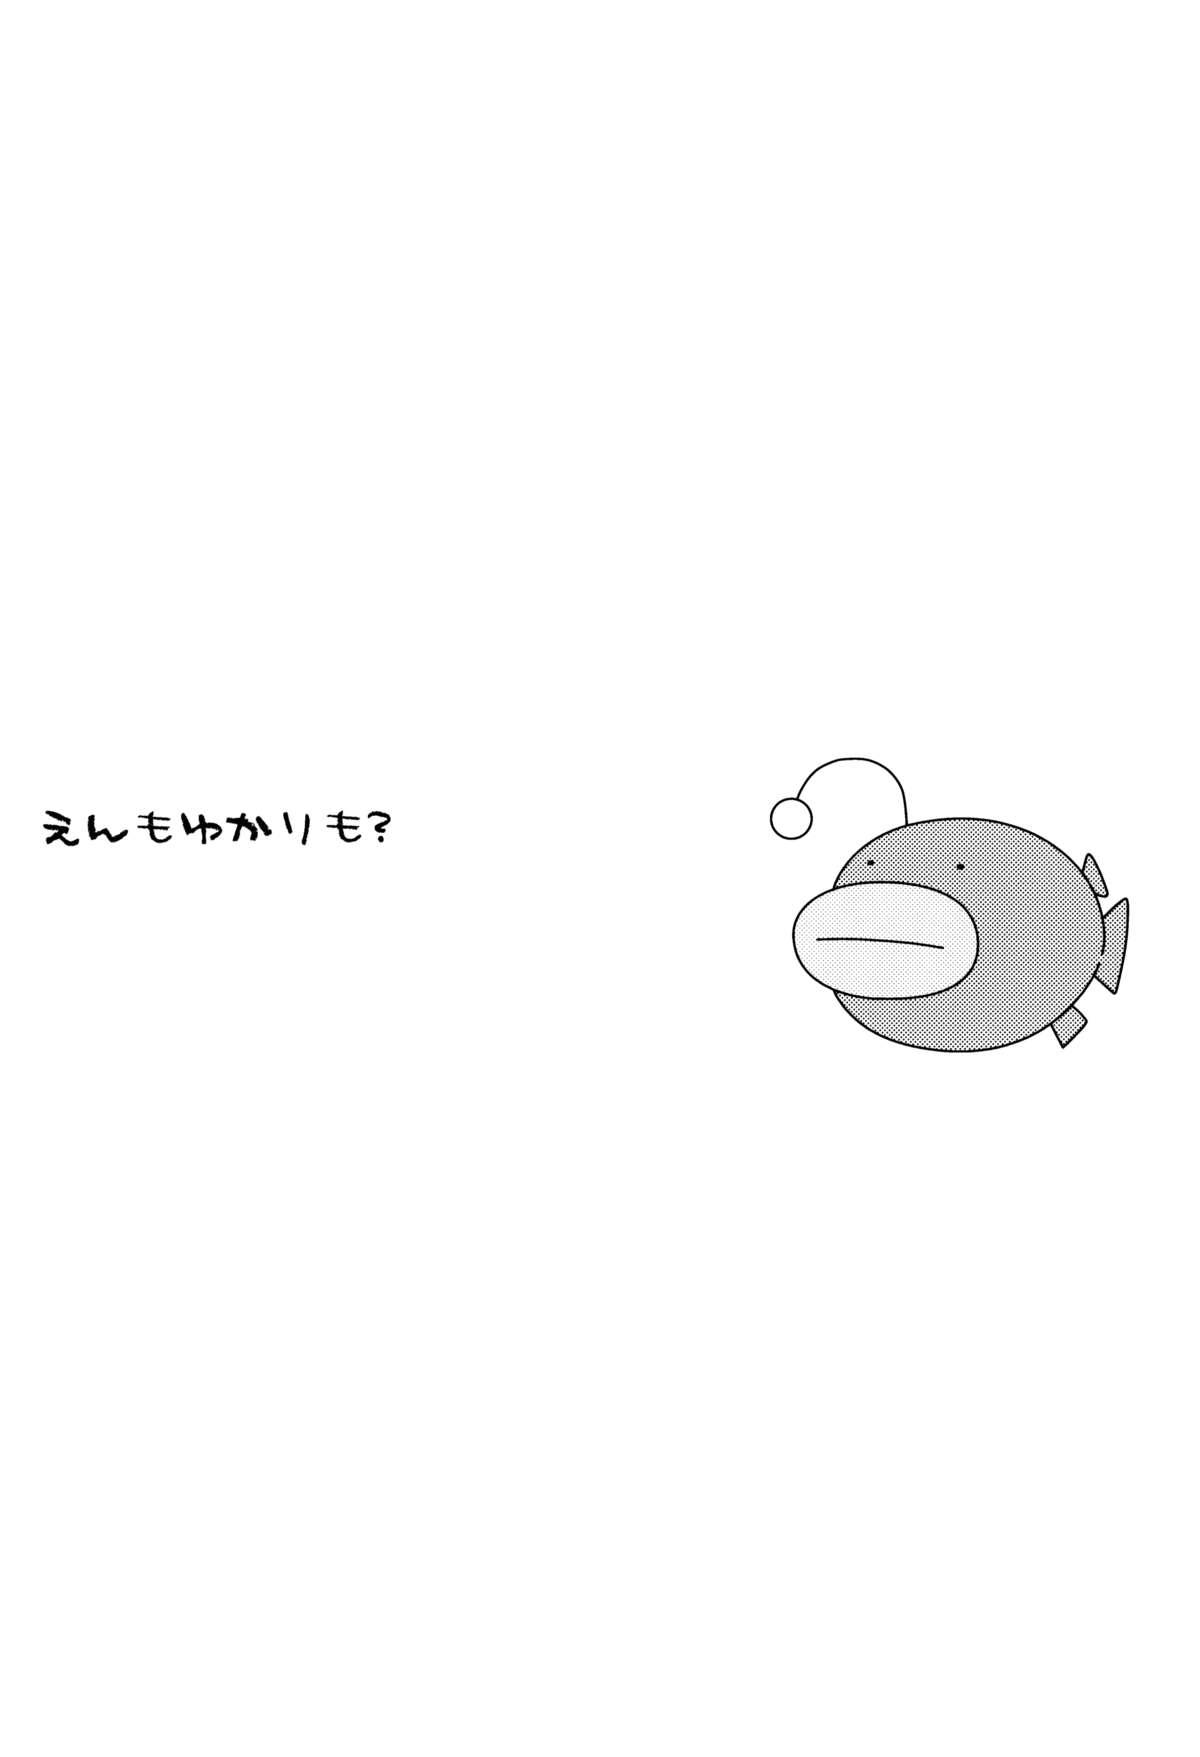 En mo Yukari mo? 3